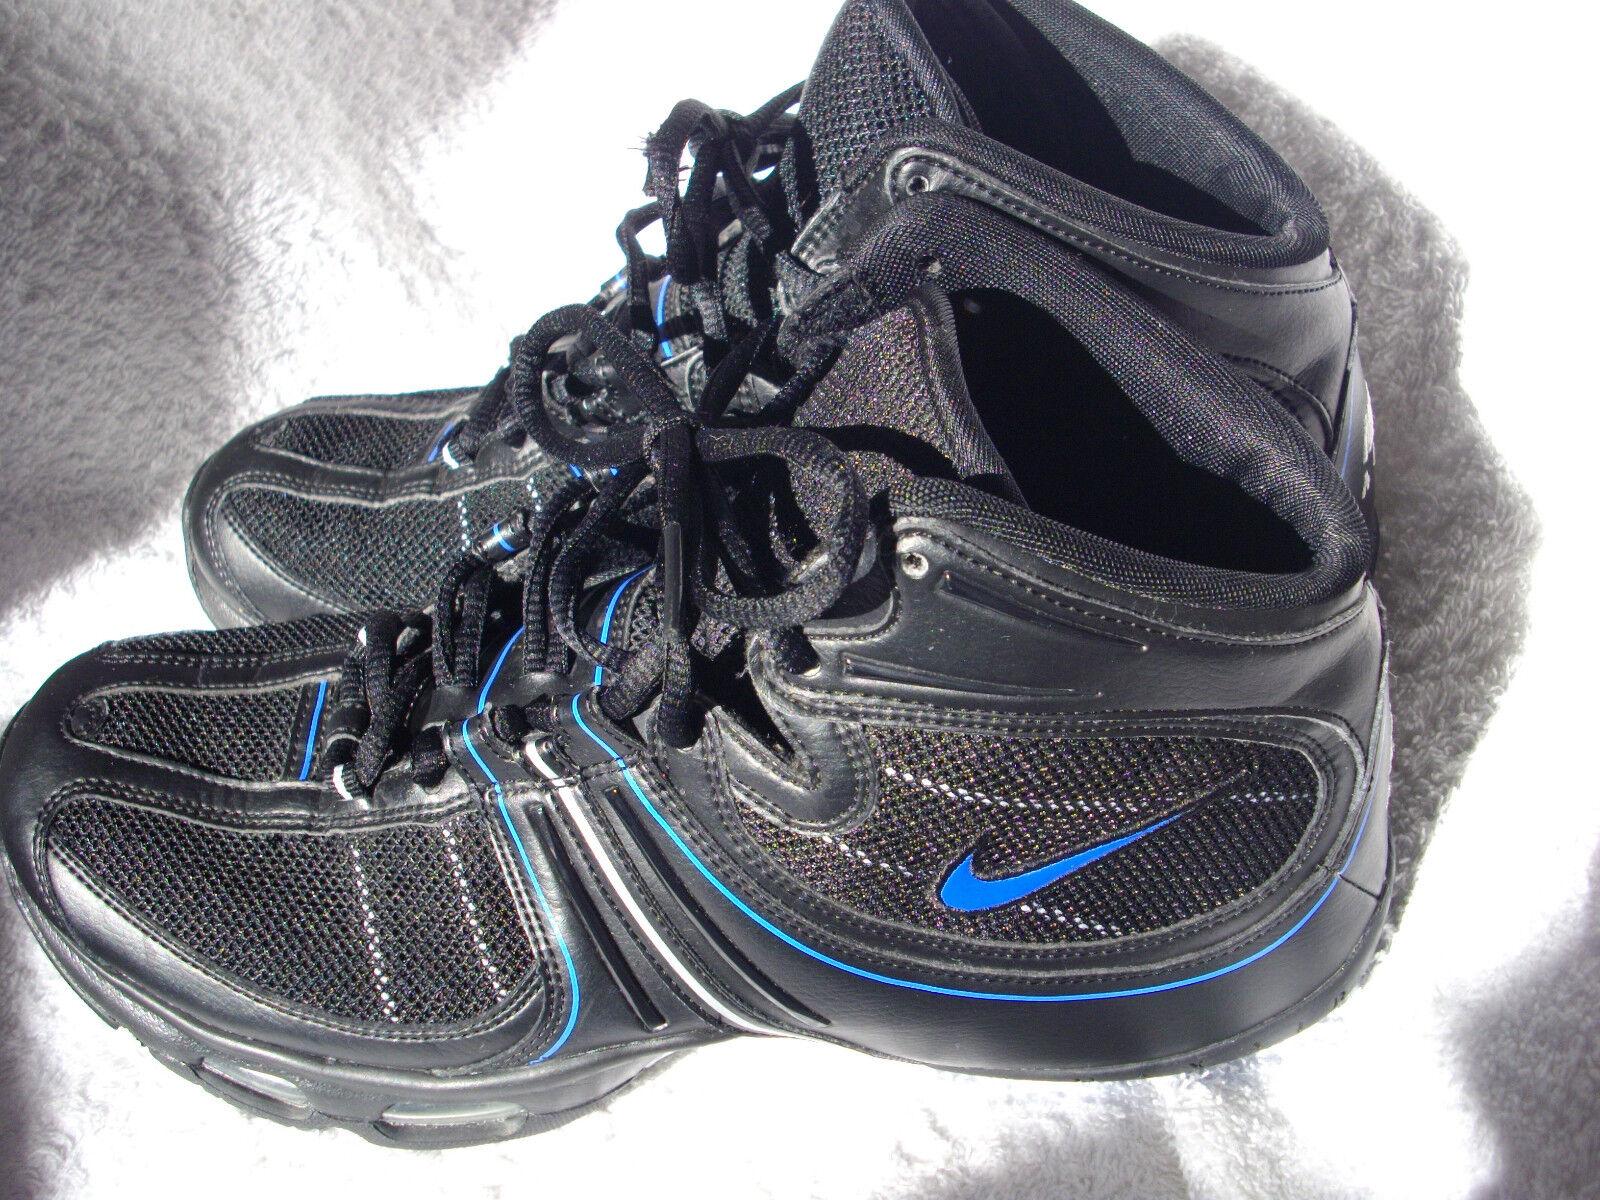 Genuine Nike Talla Max NetDuralon, Negro Air, Talla Nike a5b030